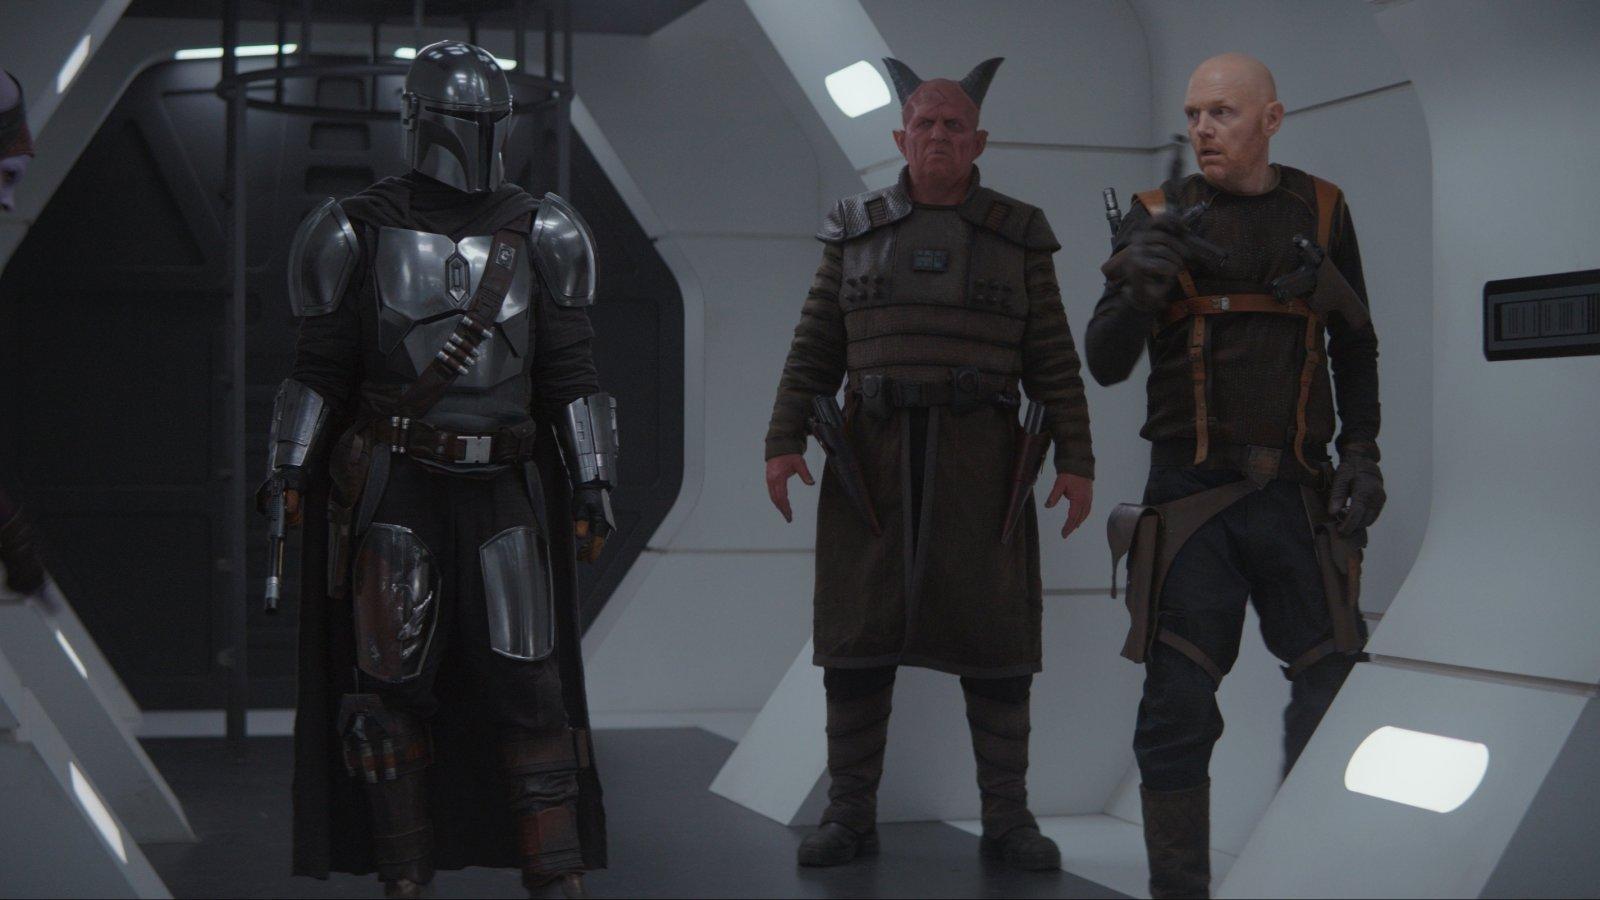 Is The Mandalorian Season 2 Becoming Too Skywalker Saga Centric